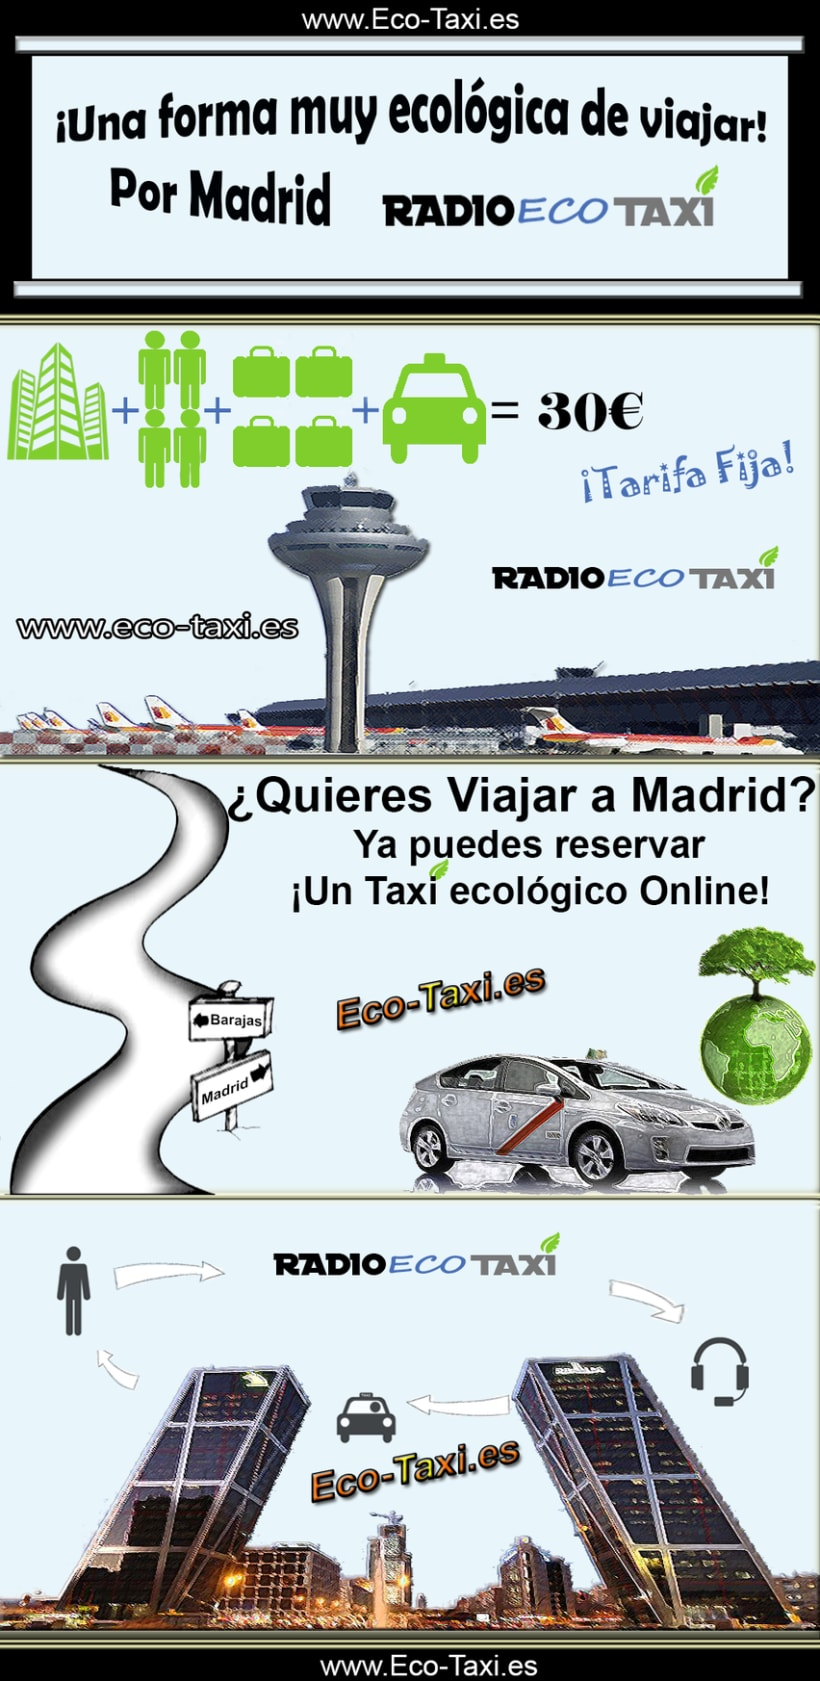 ¡Viajar por Madrid! Taxi ecológico -1